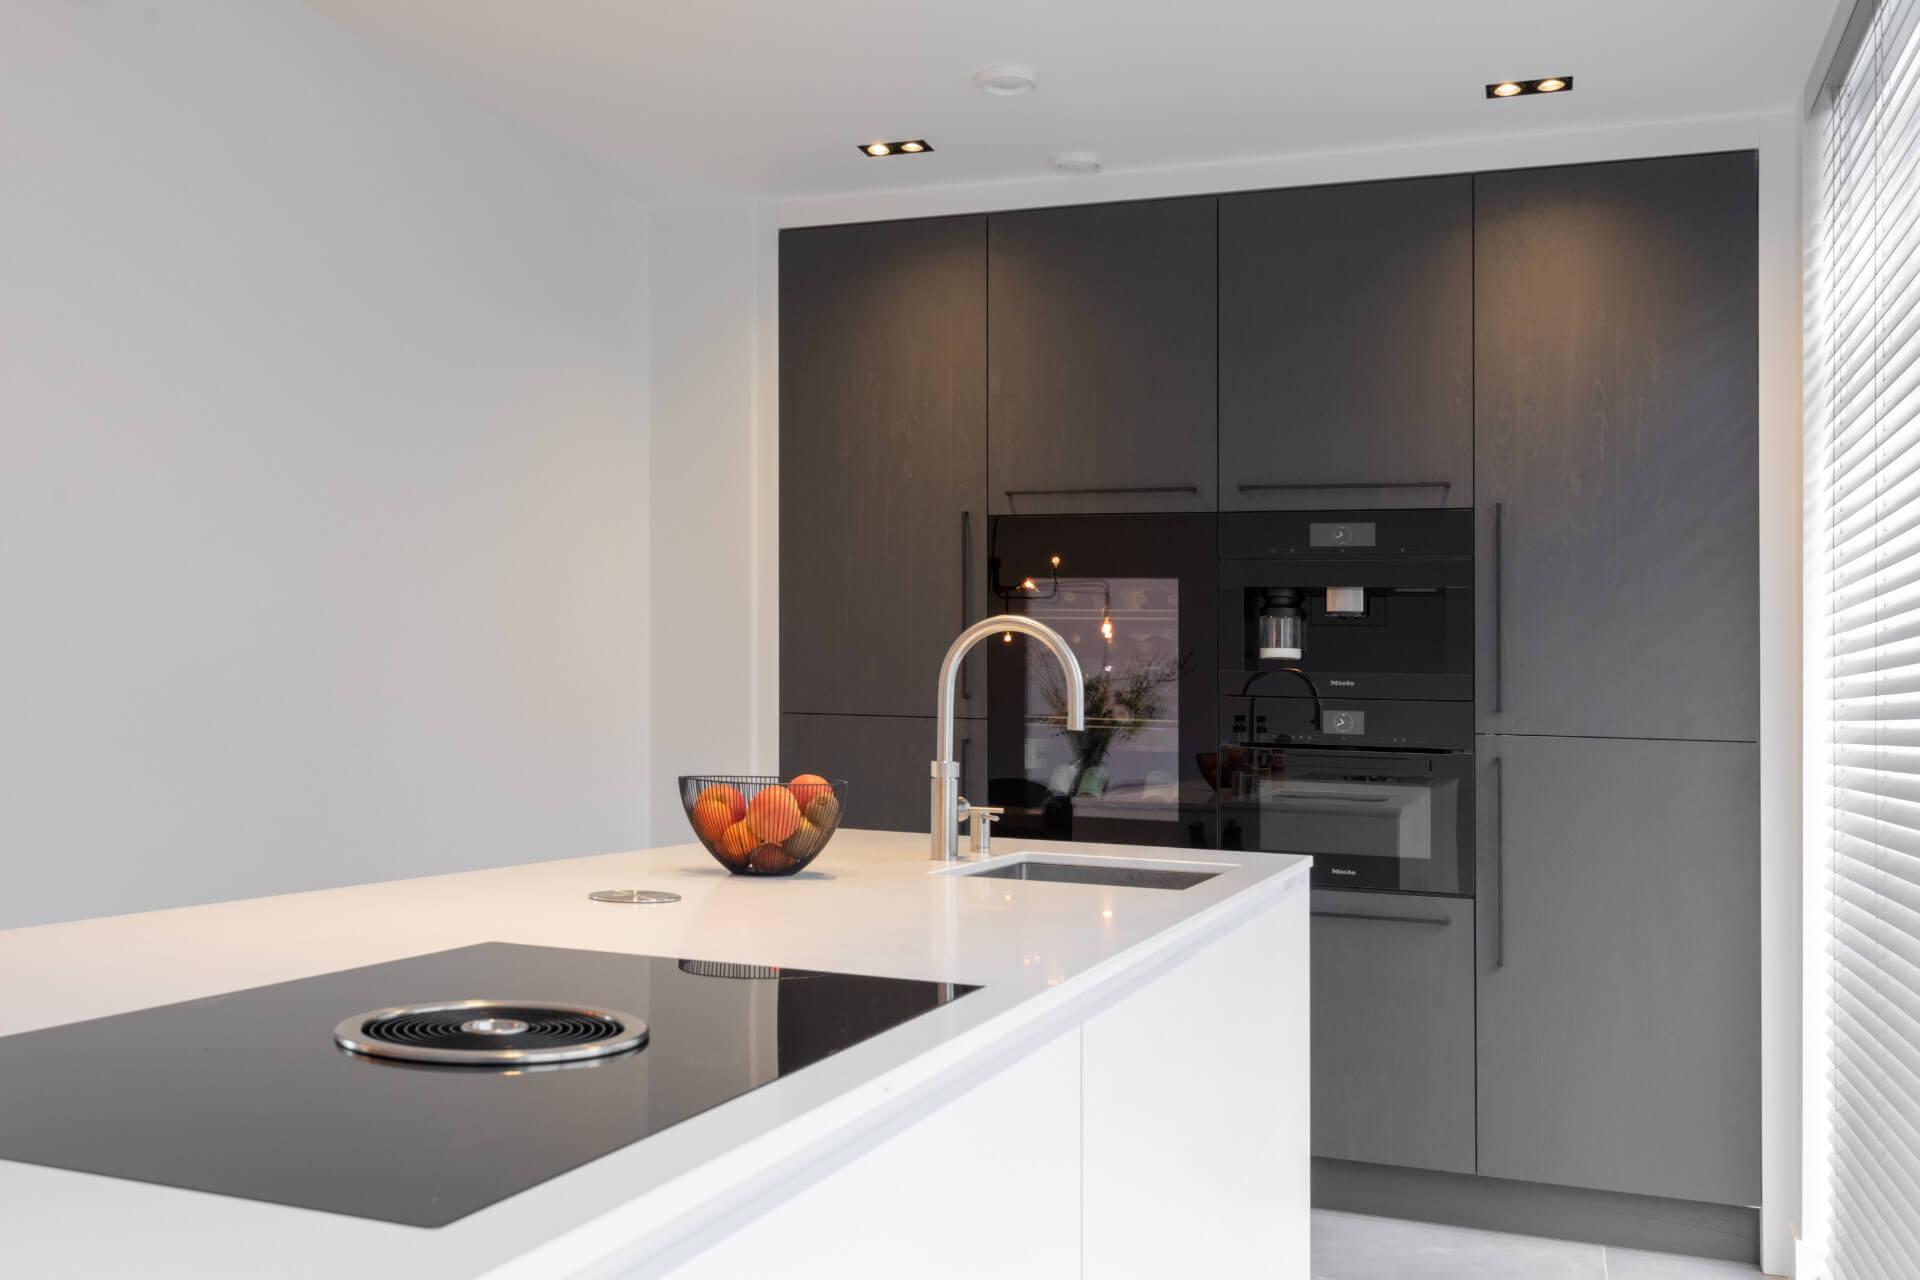 Moderne keuken met Quooker en Miele apparatuur | Hoevelaken